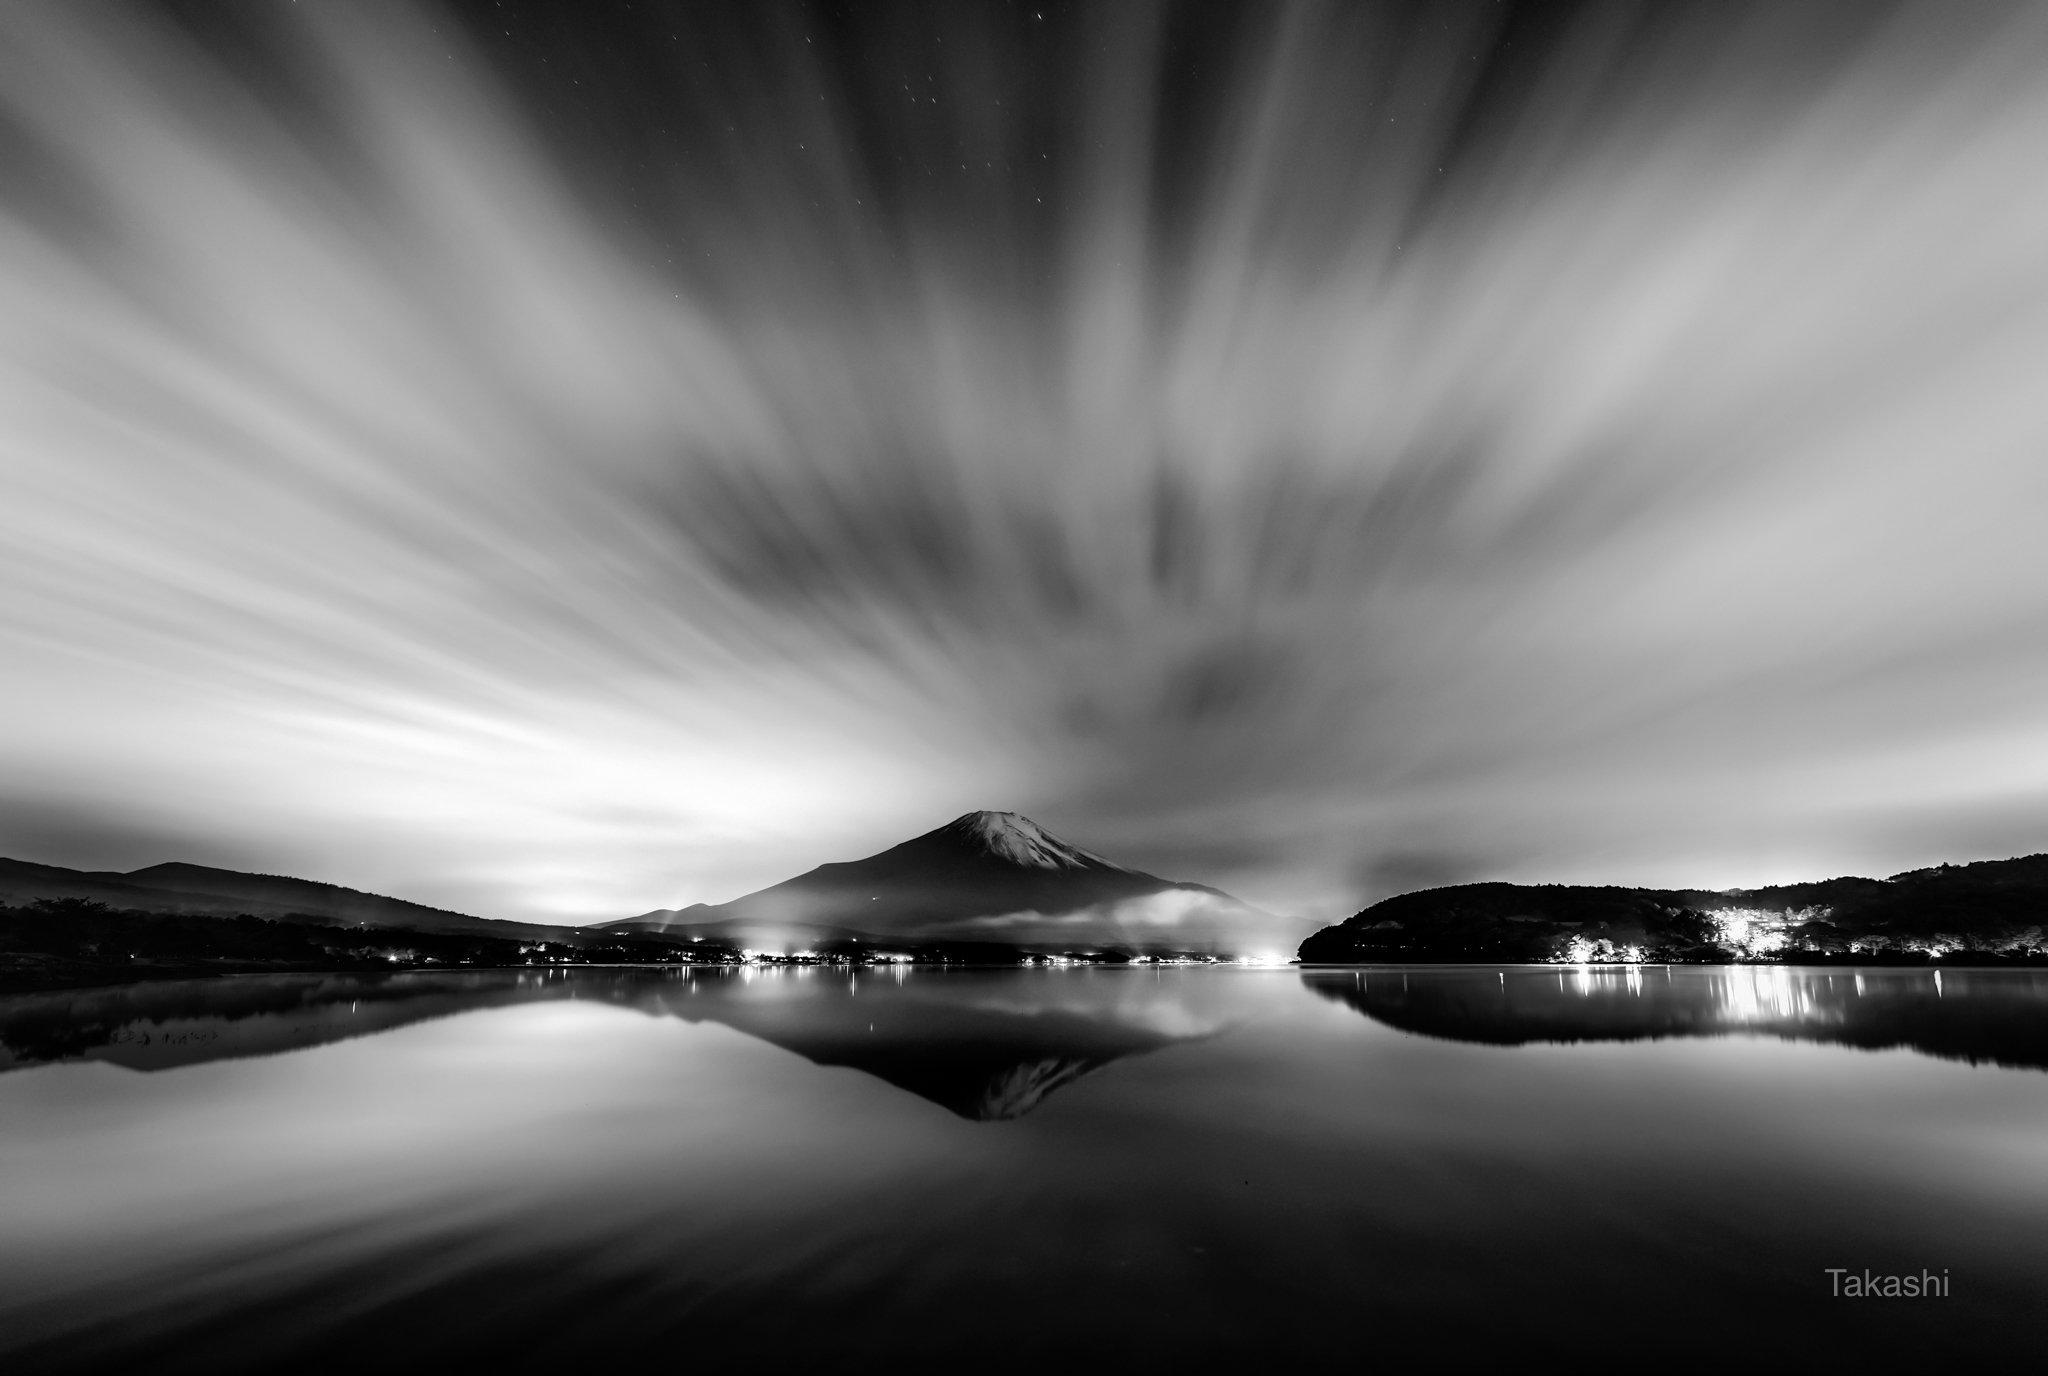 Fuji,mountain,Japan,cloud,night,reflection,flow,lake,water,beautiful,amazing,wonderful,monochrome,, Takashi